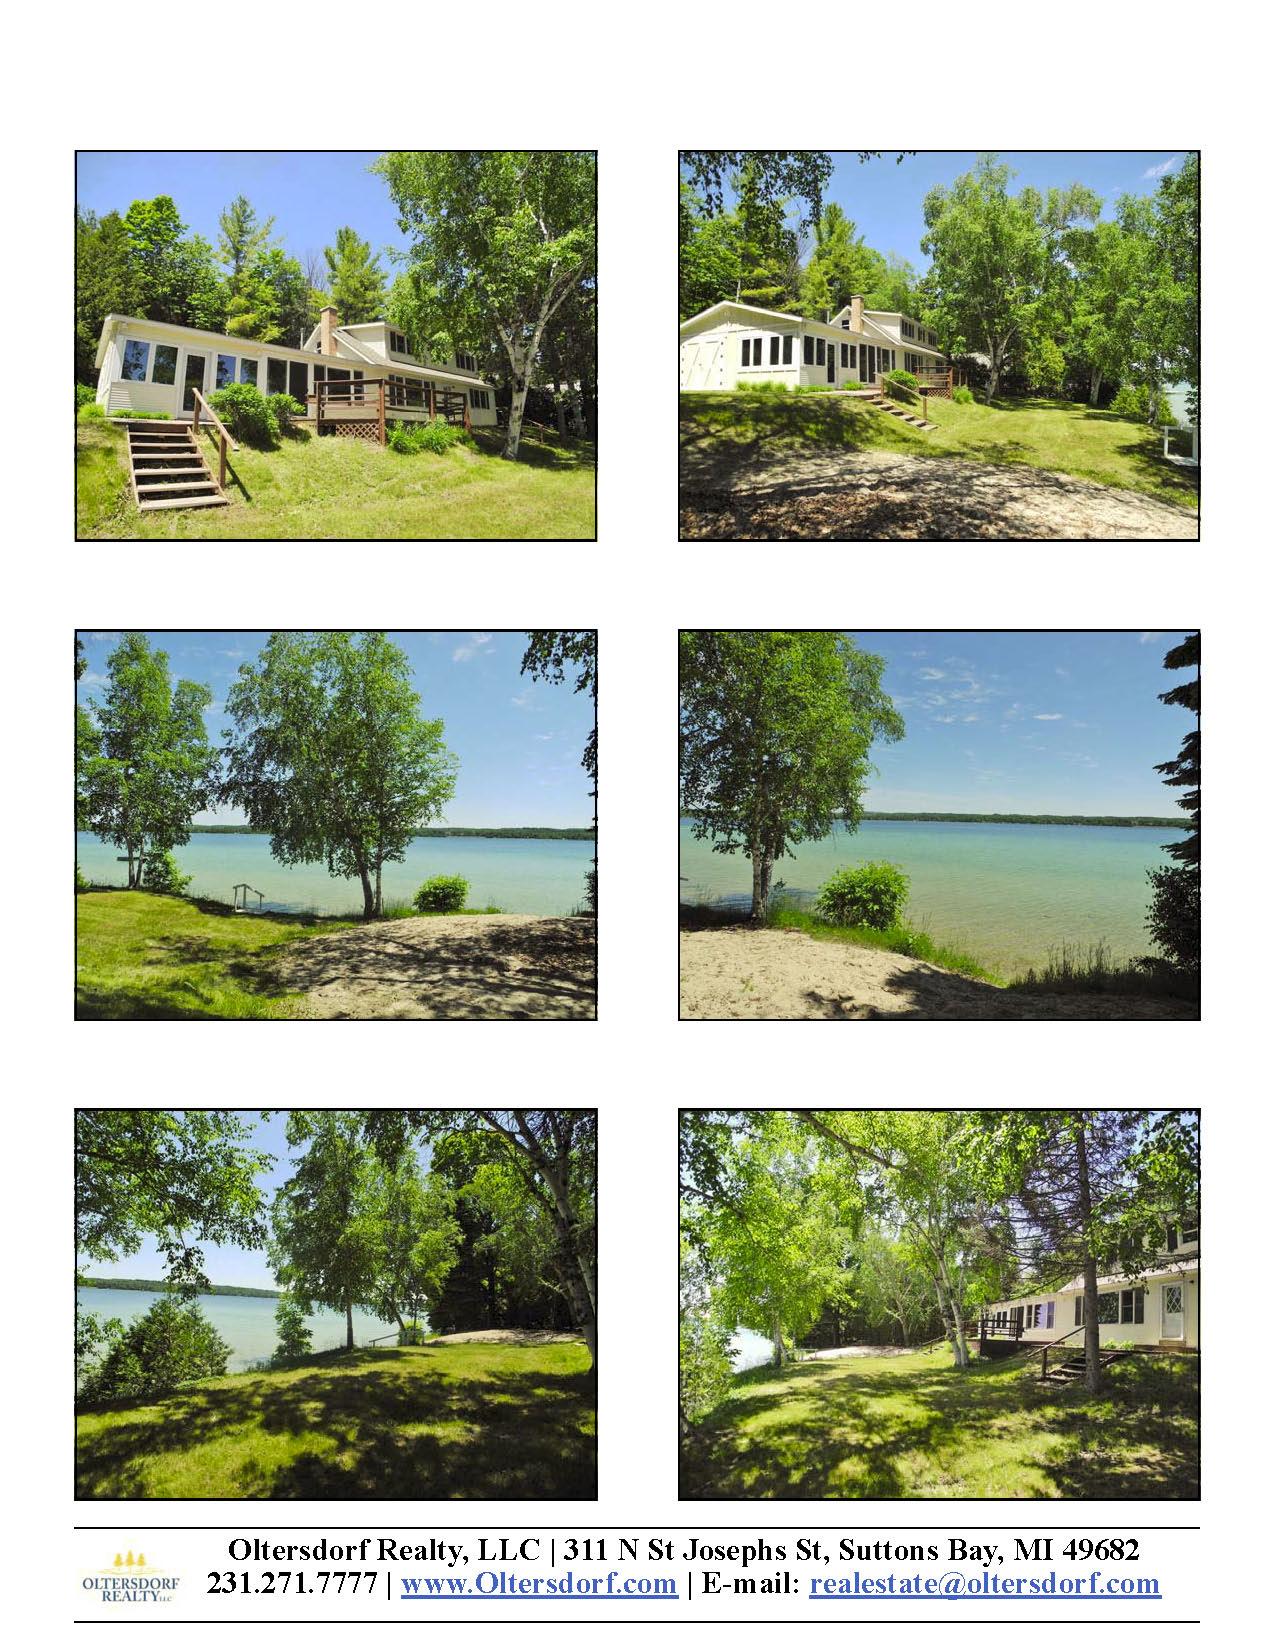 4388 N Manitou Trail, Leland - Marketing packet by Oltersdorf Realty LLC (3).jpg